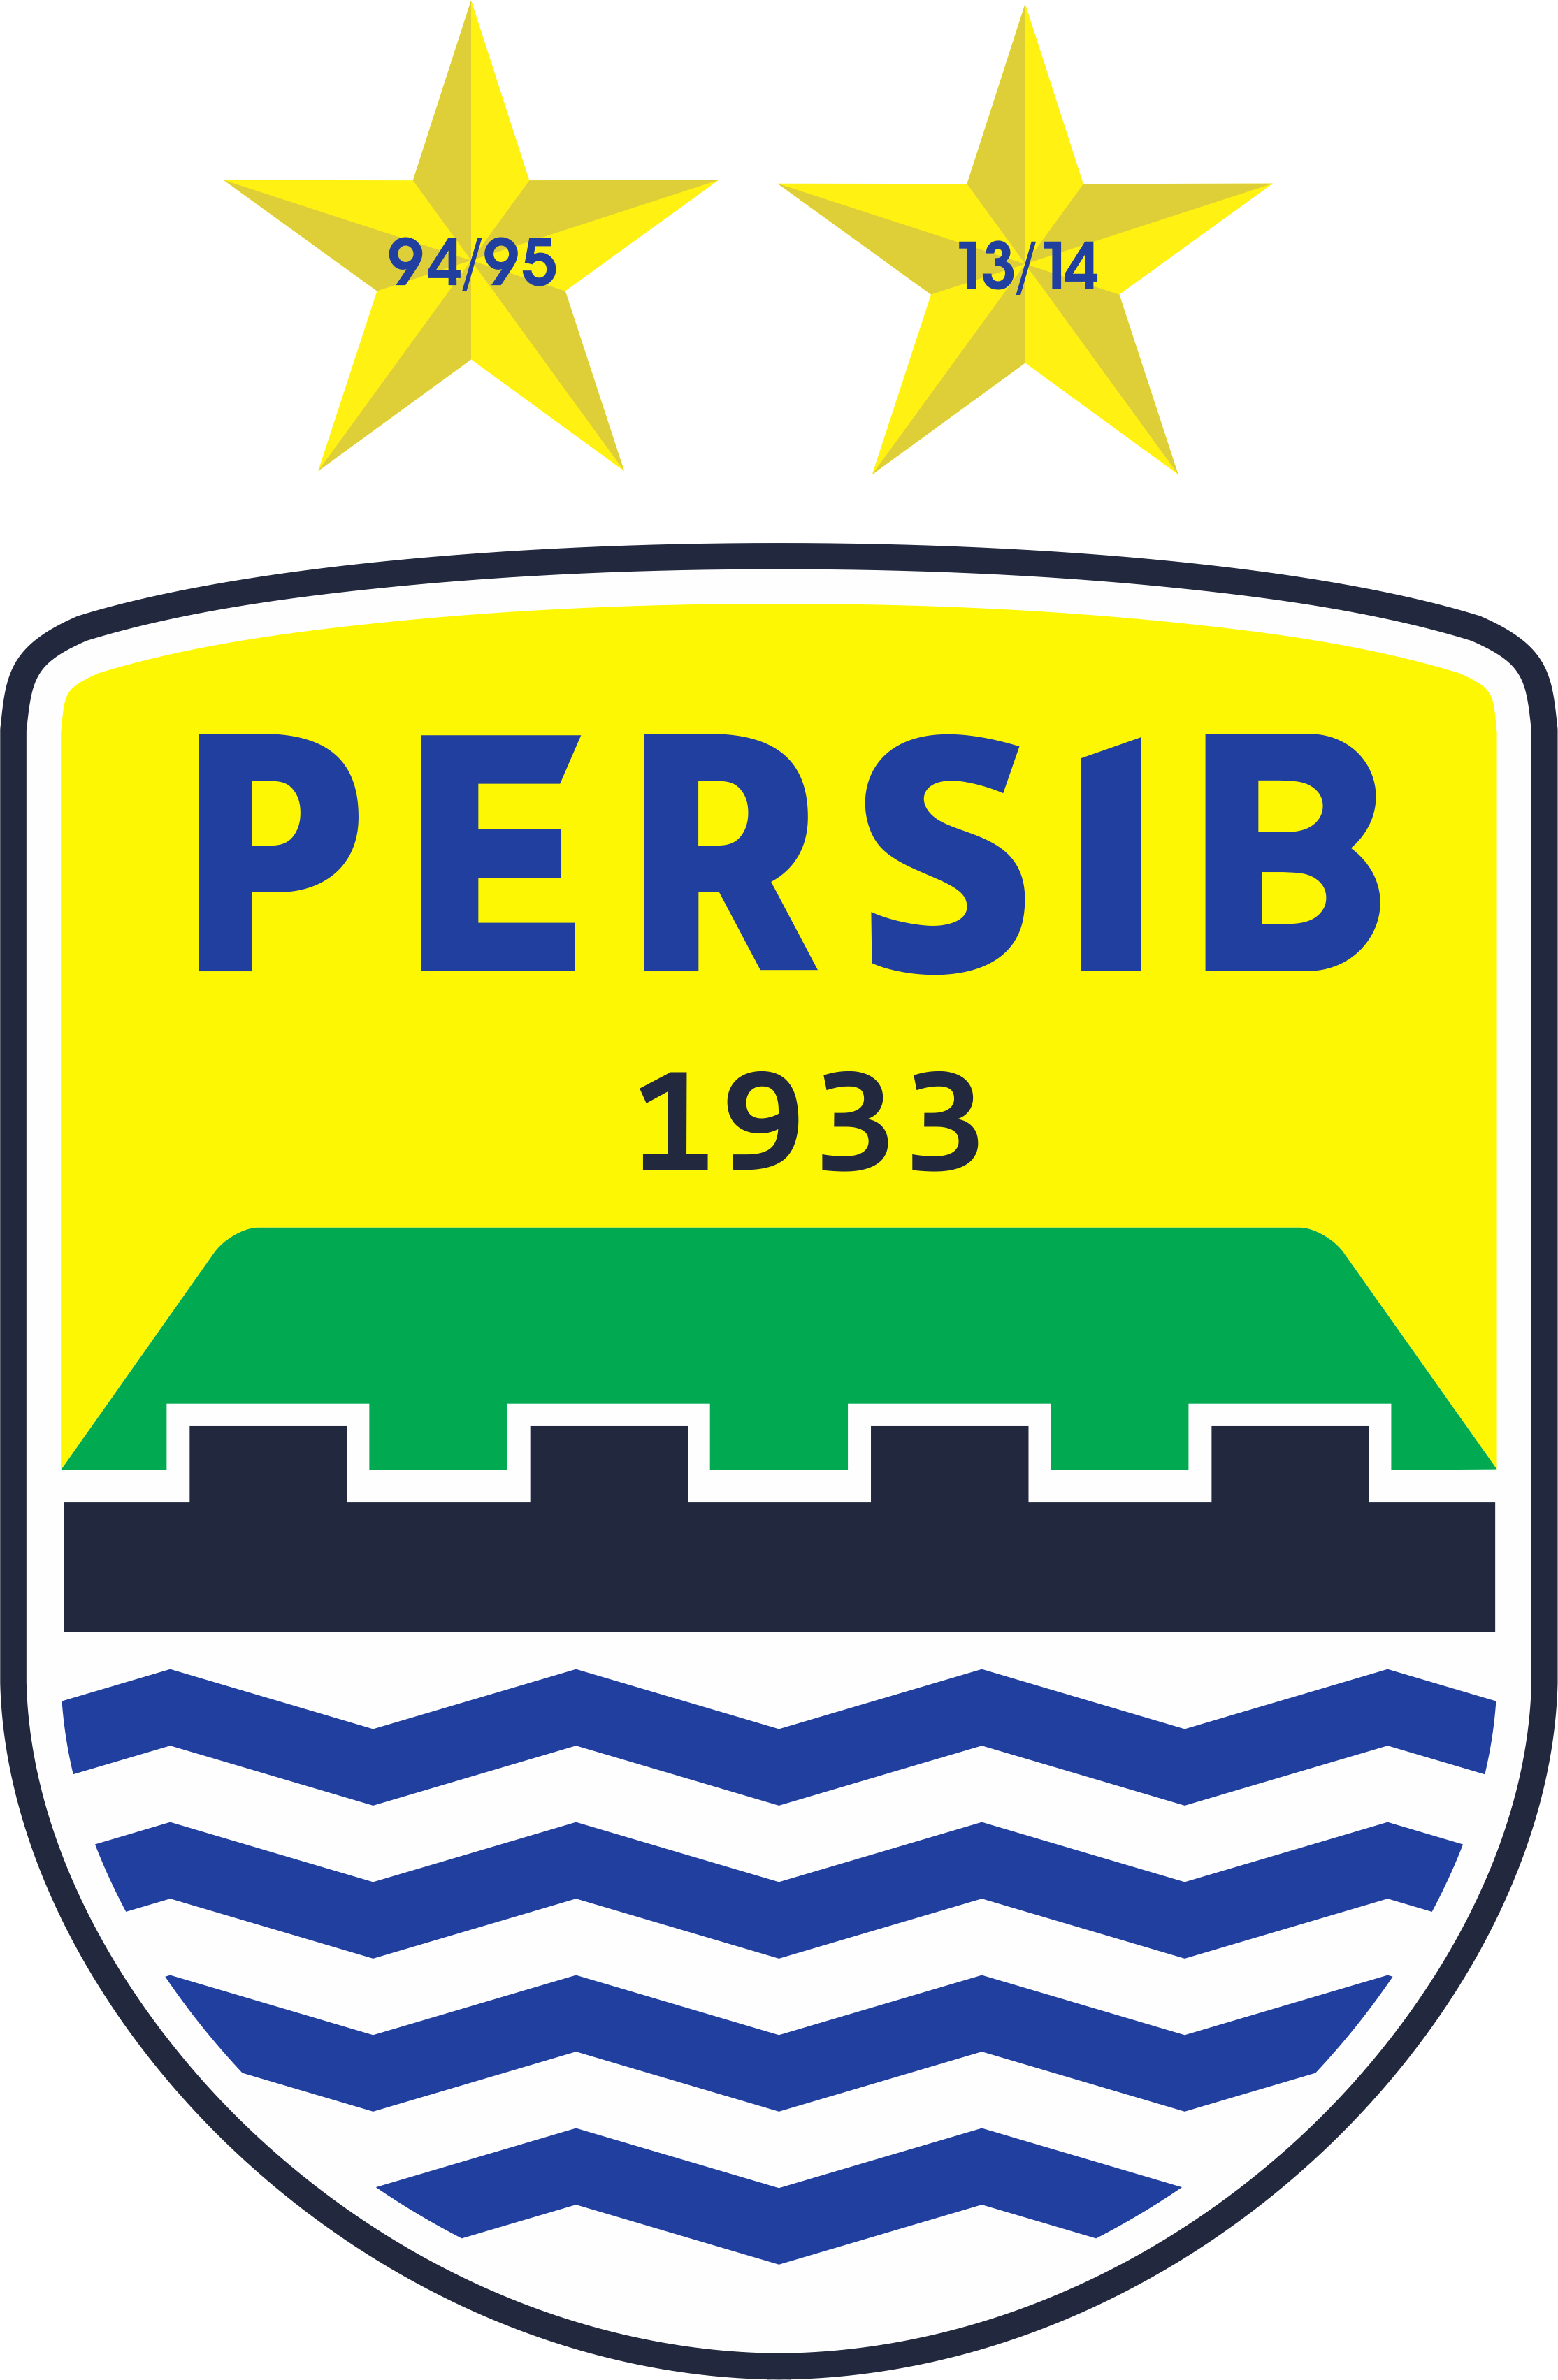 Persib Logo Image Soccer Logo Football Logo Graphic Design Logo